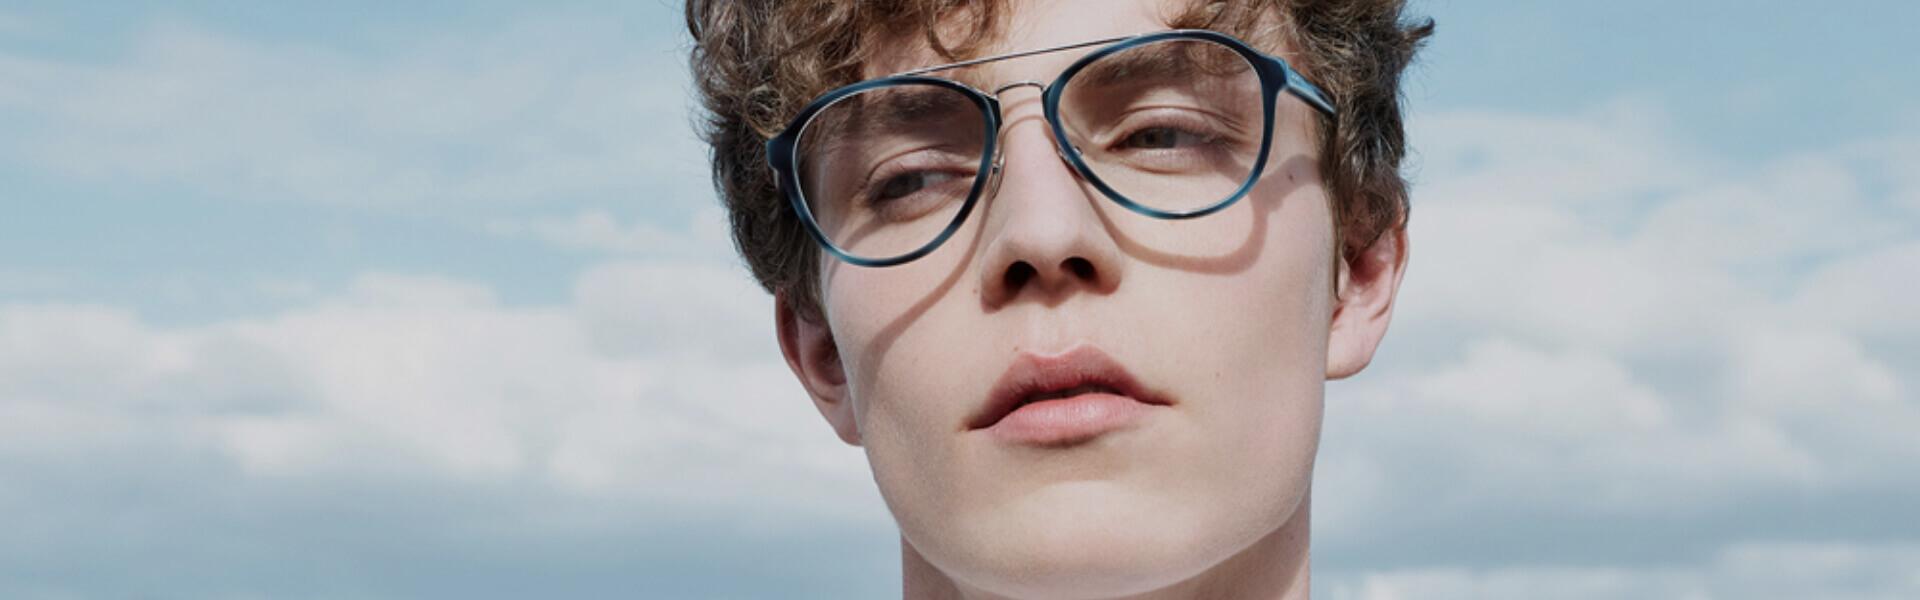 calvin klein glasses specscart